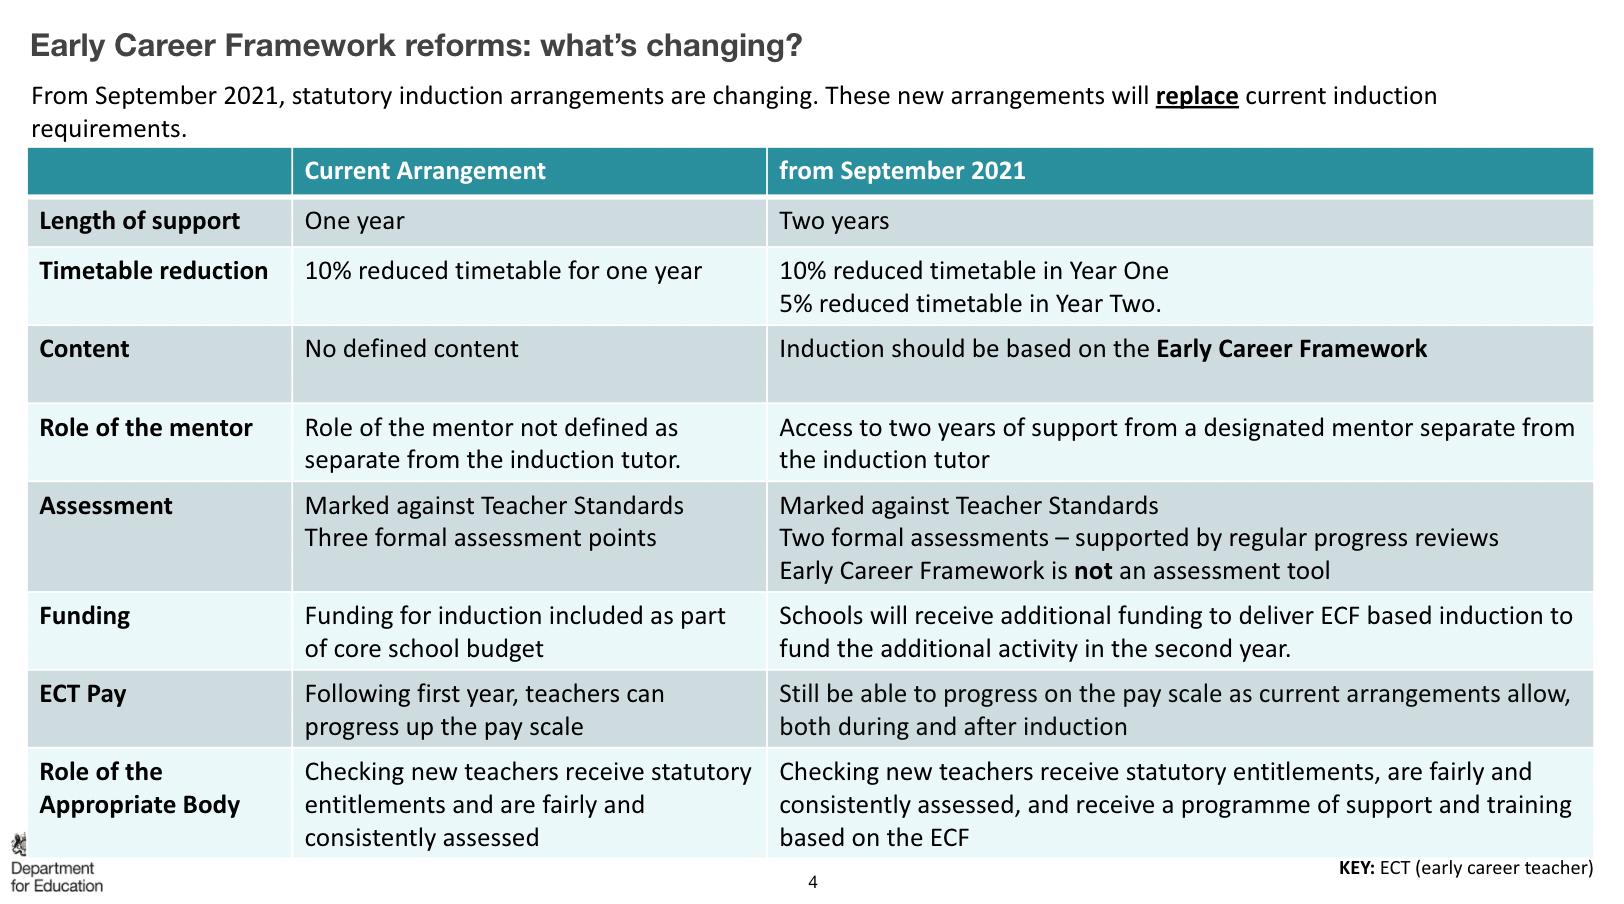 Early Career Framework reforms